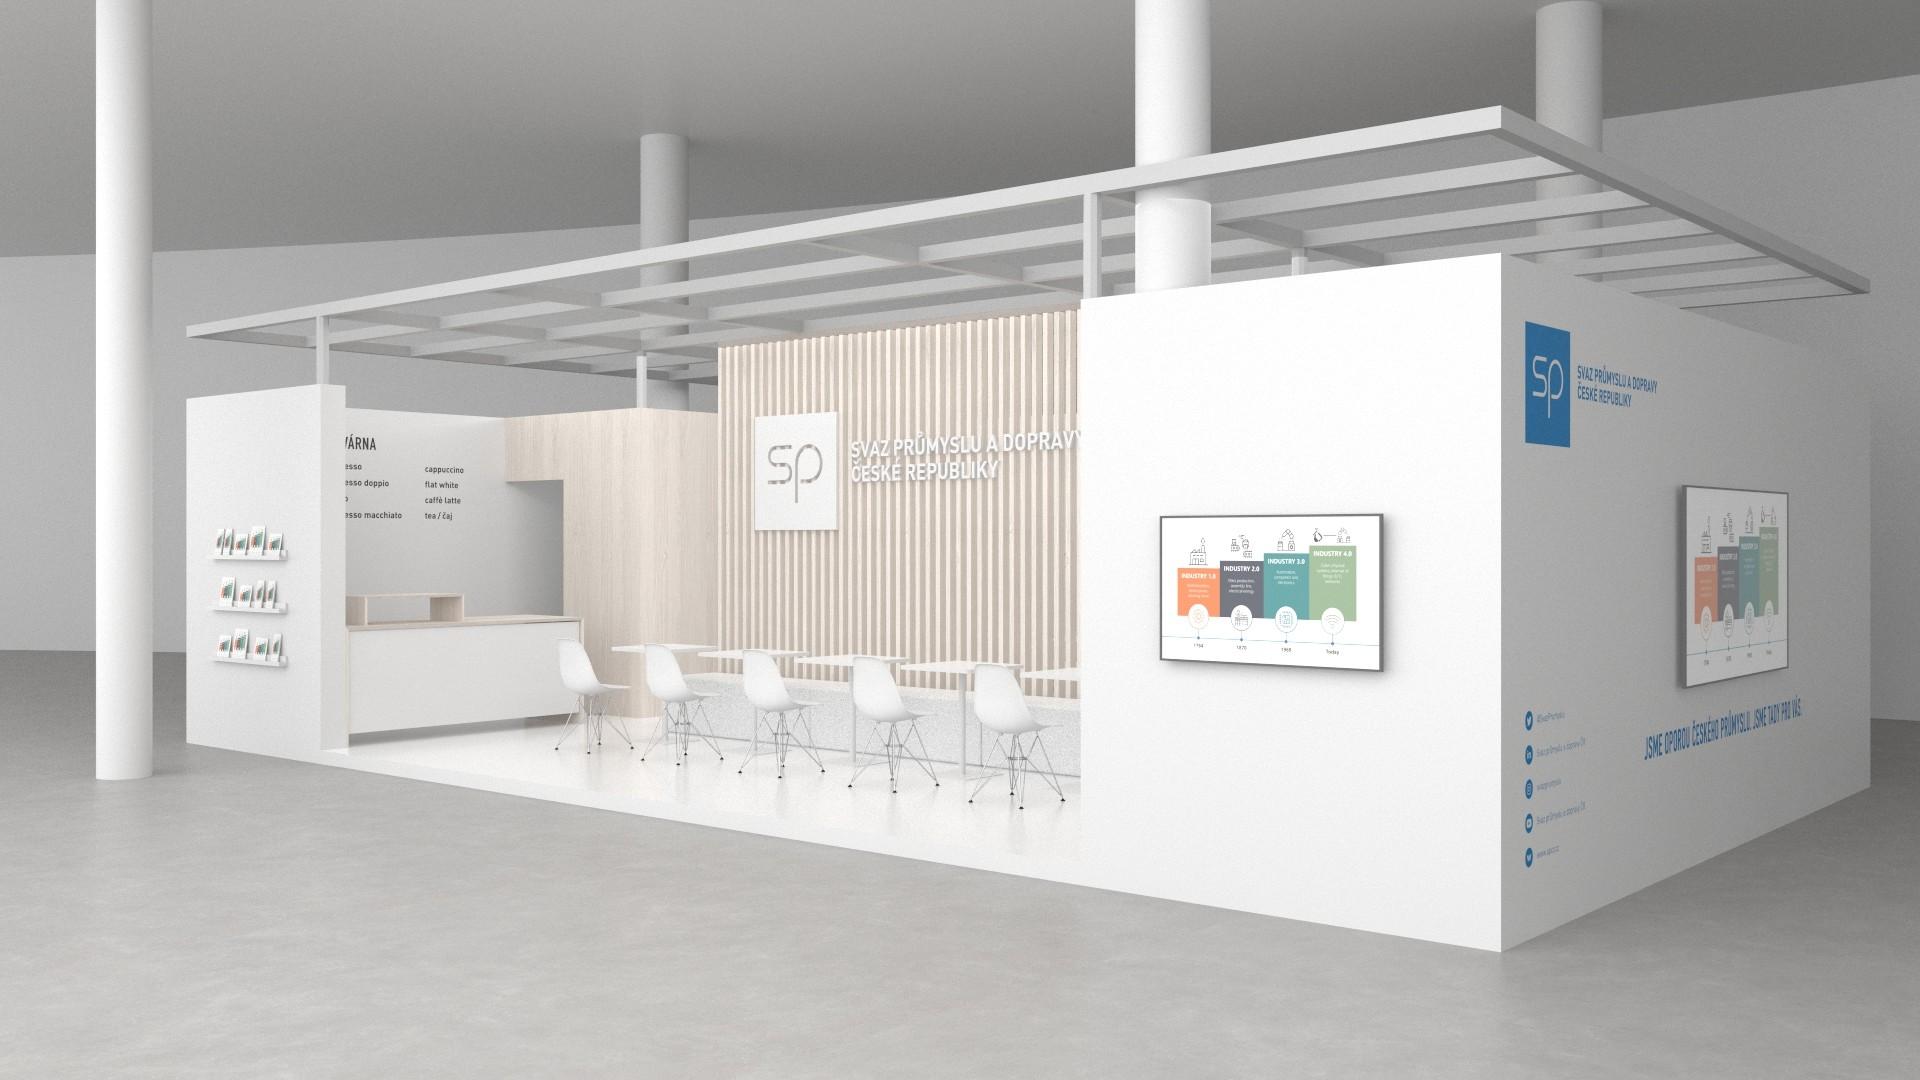 SPCR TZ Kavarna Svazu prumyslu Vizualizace web